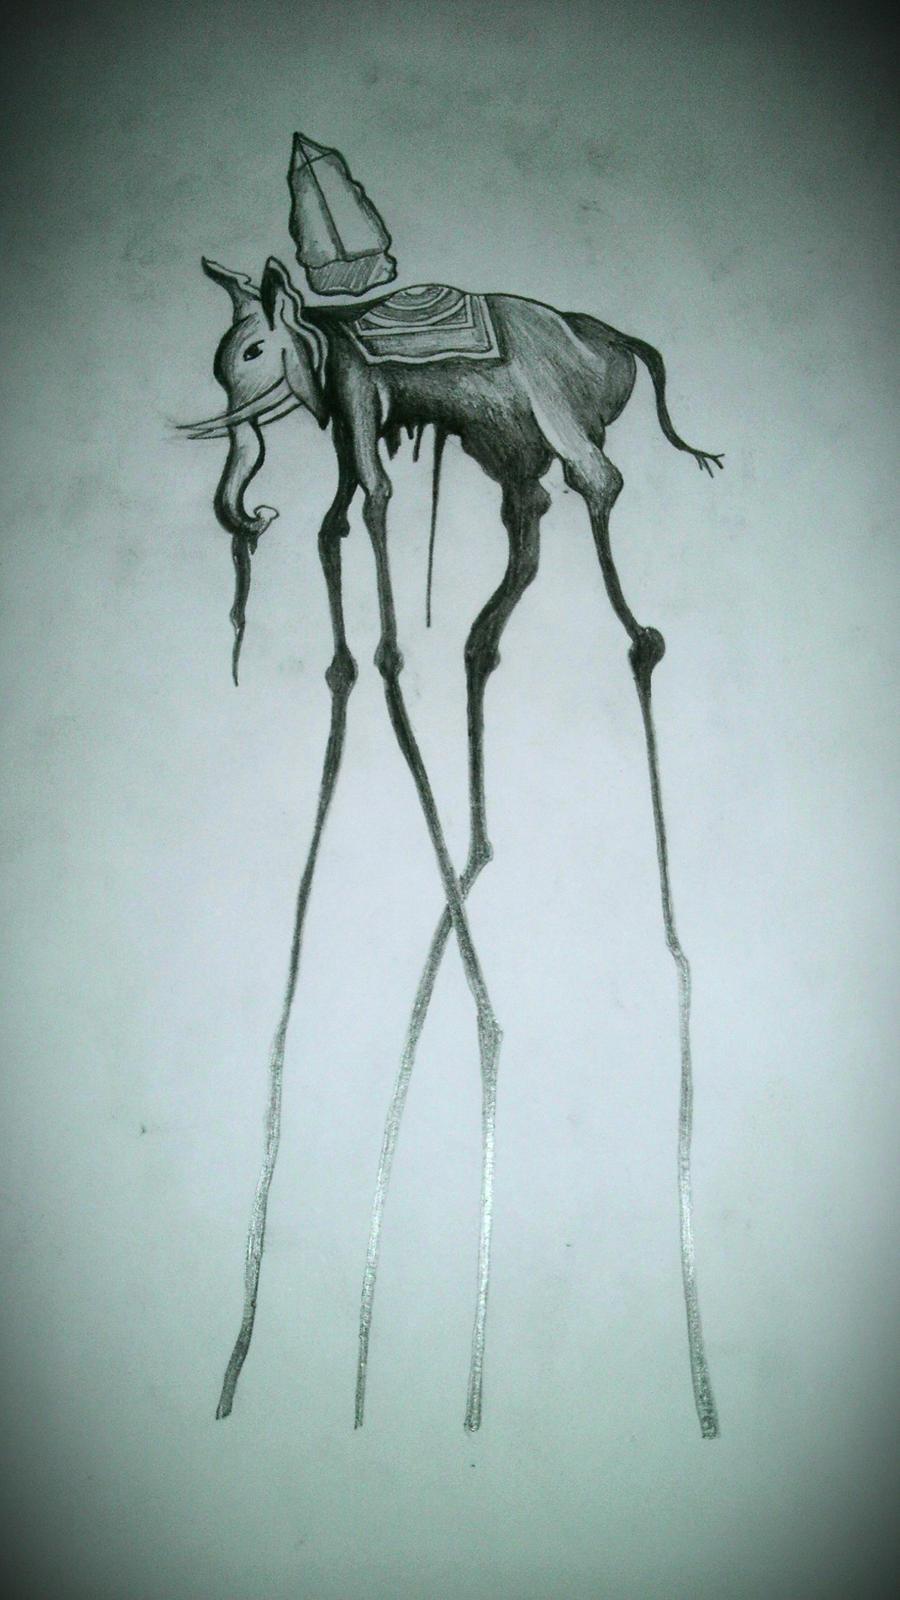 Dali elephant 2 by afictiontale traditional art body art body